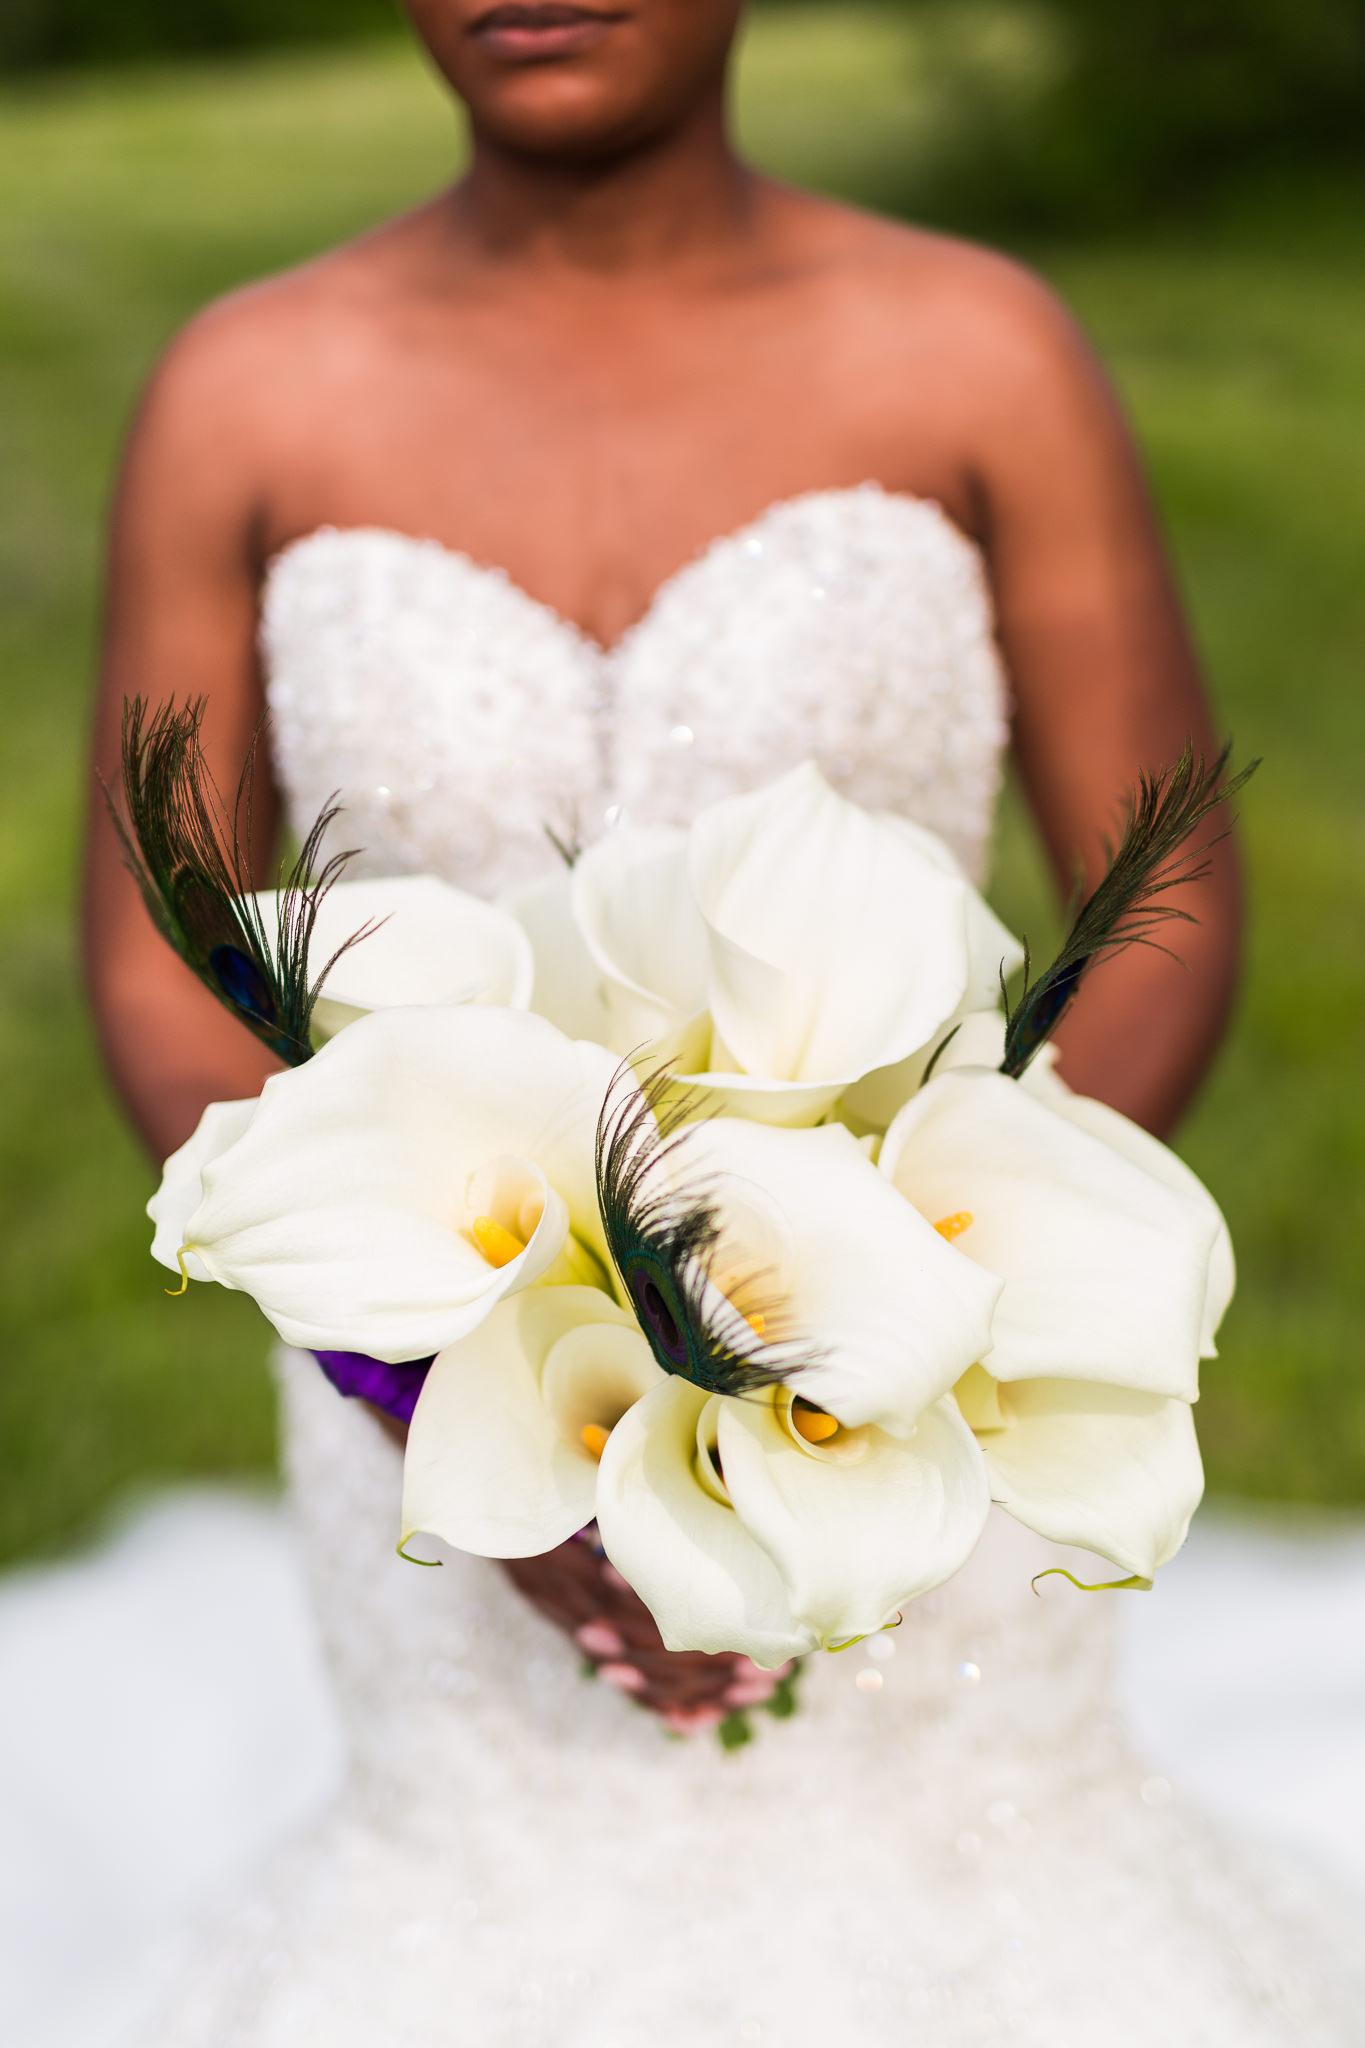 st-louis-photographer-machinist-hall-wedding-17.jpg